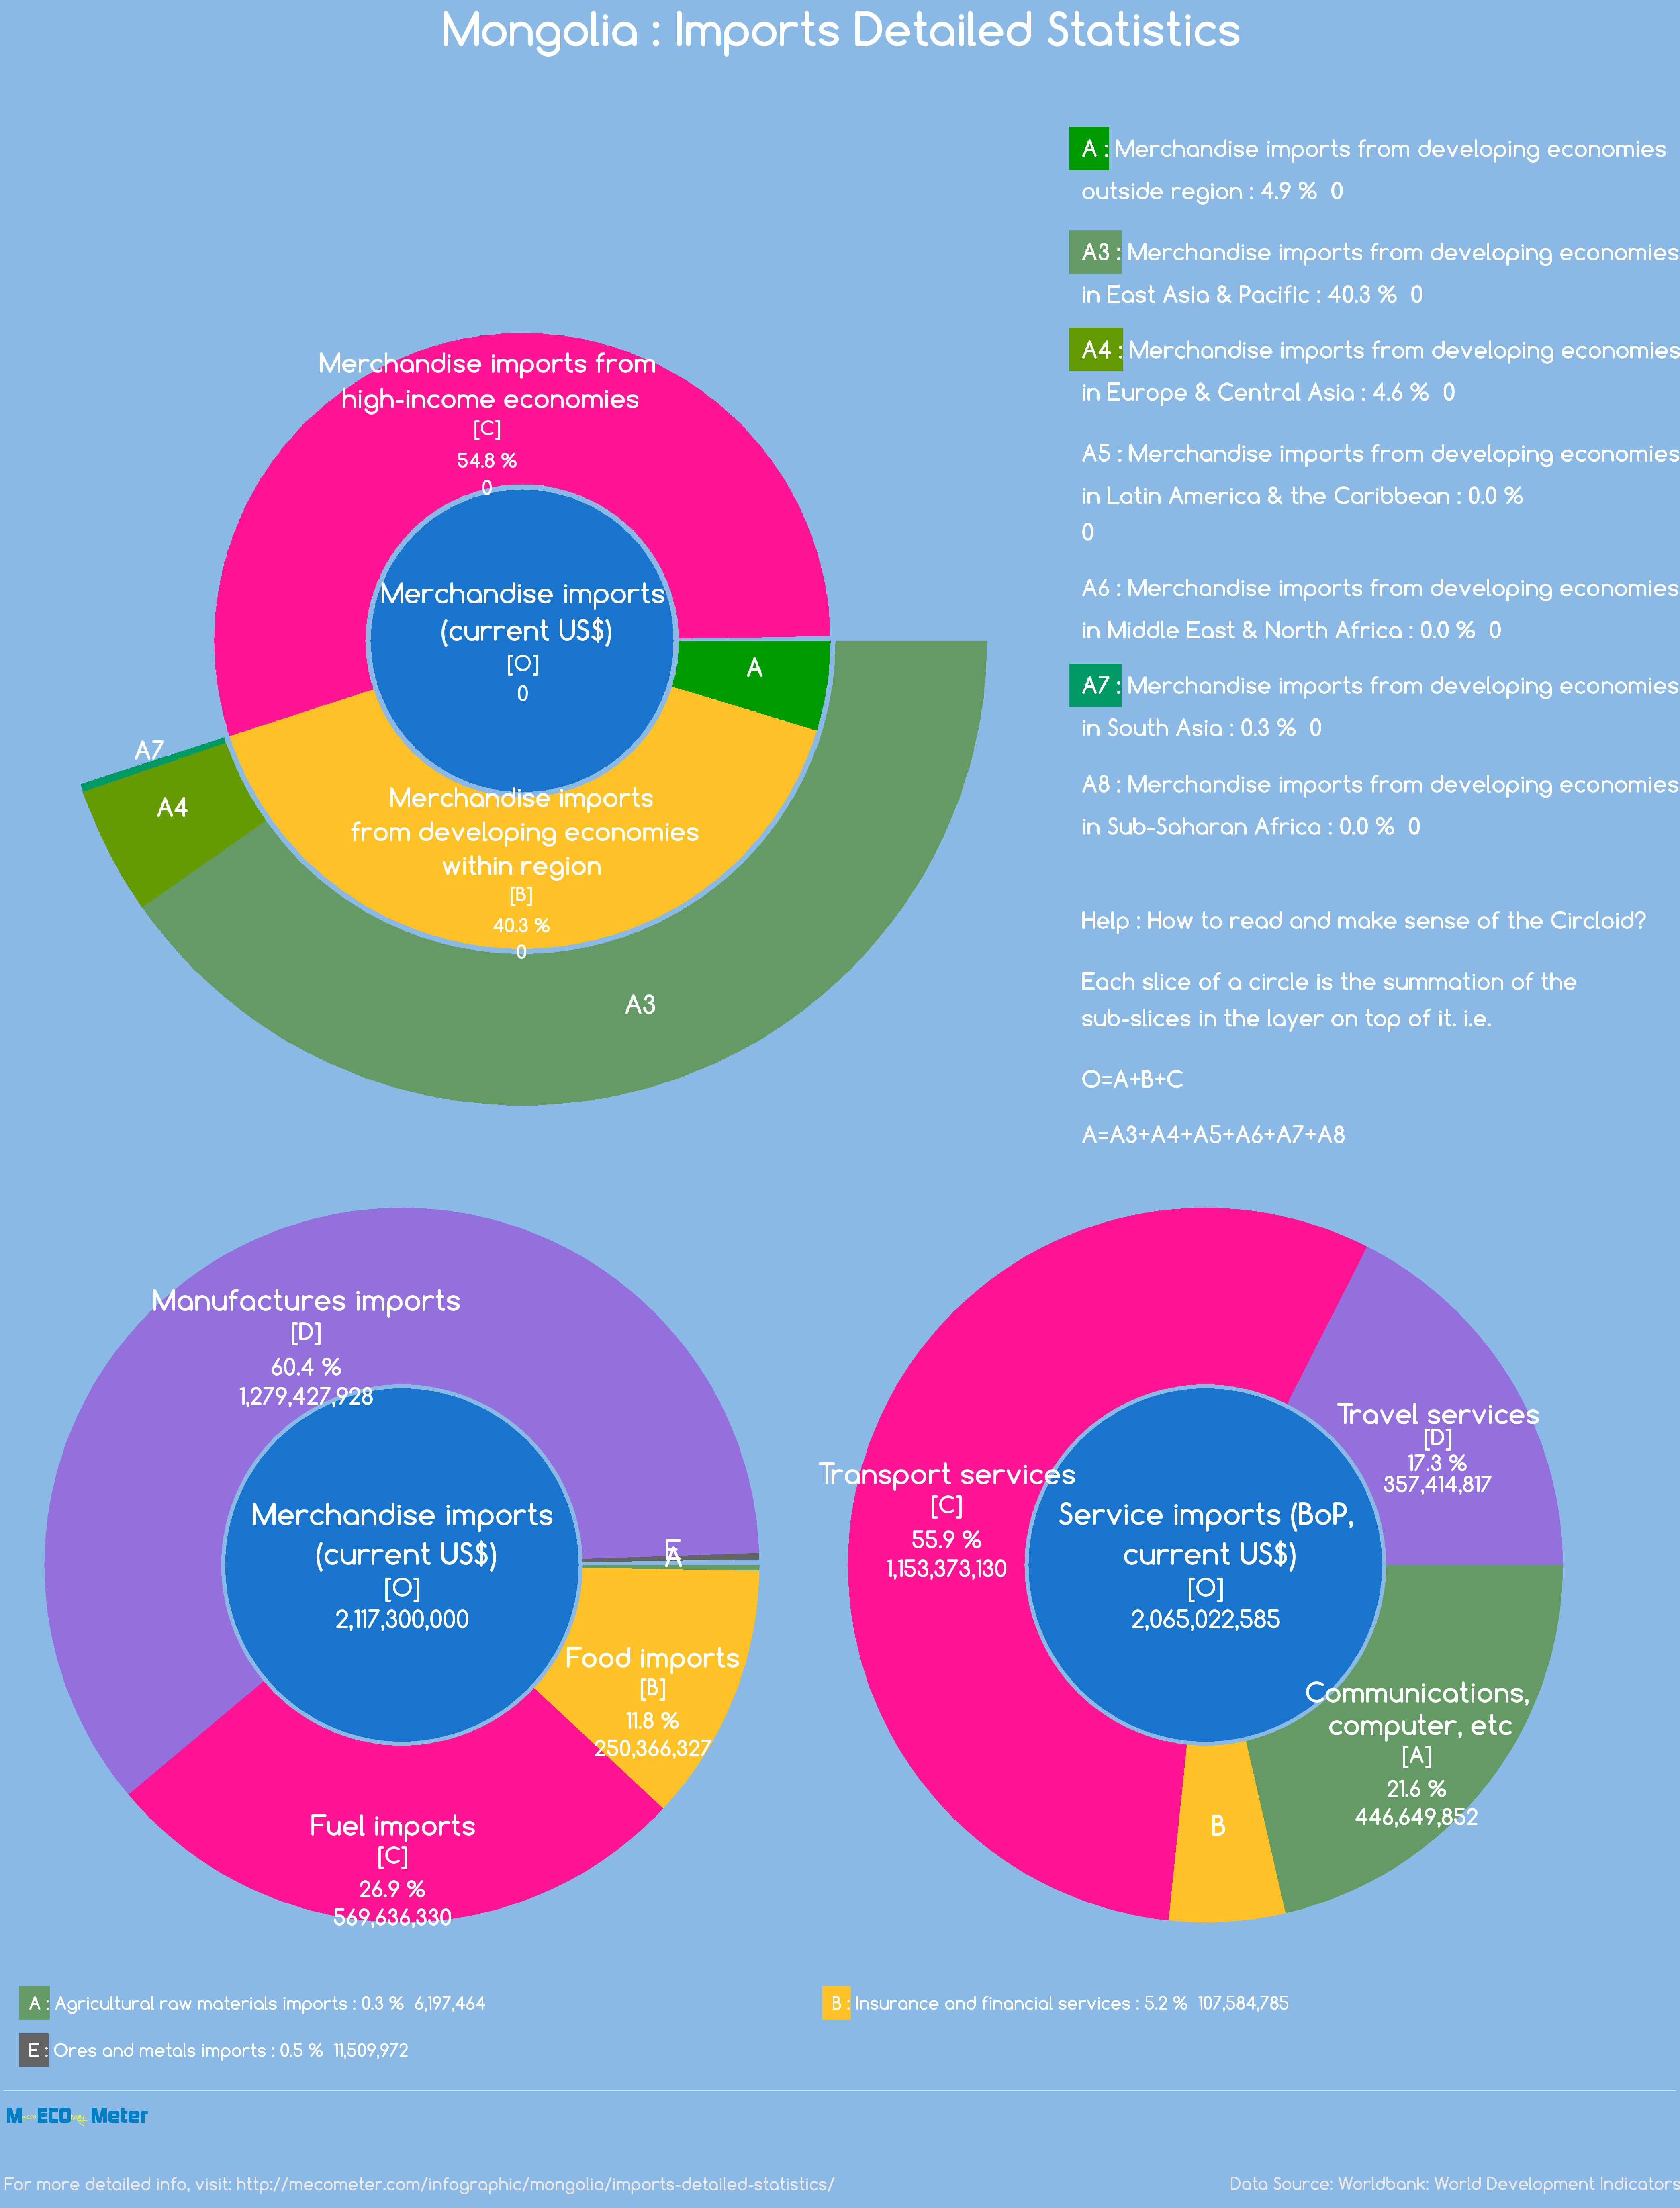 Mongolia : Imports Detailed Statistics